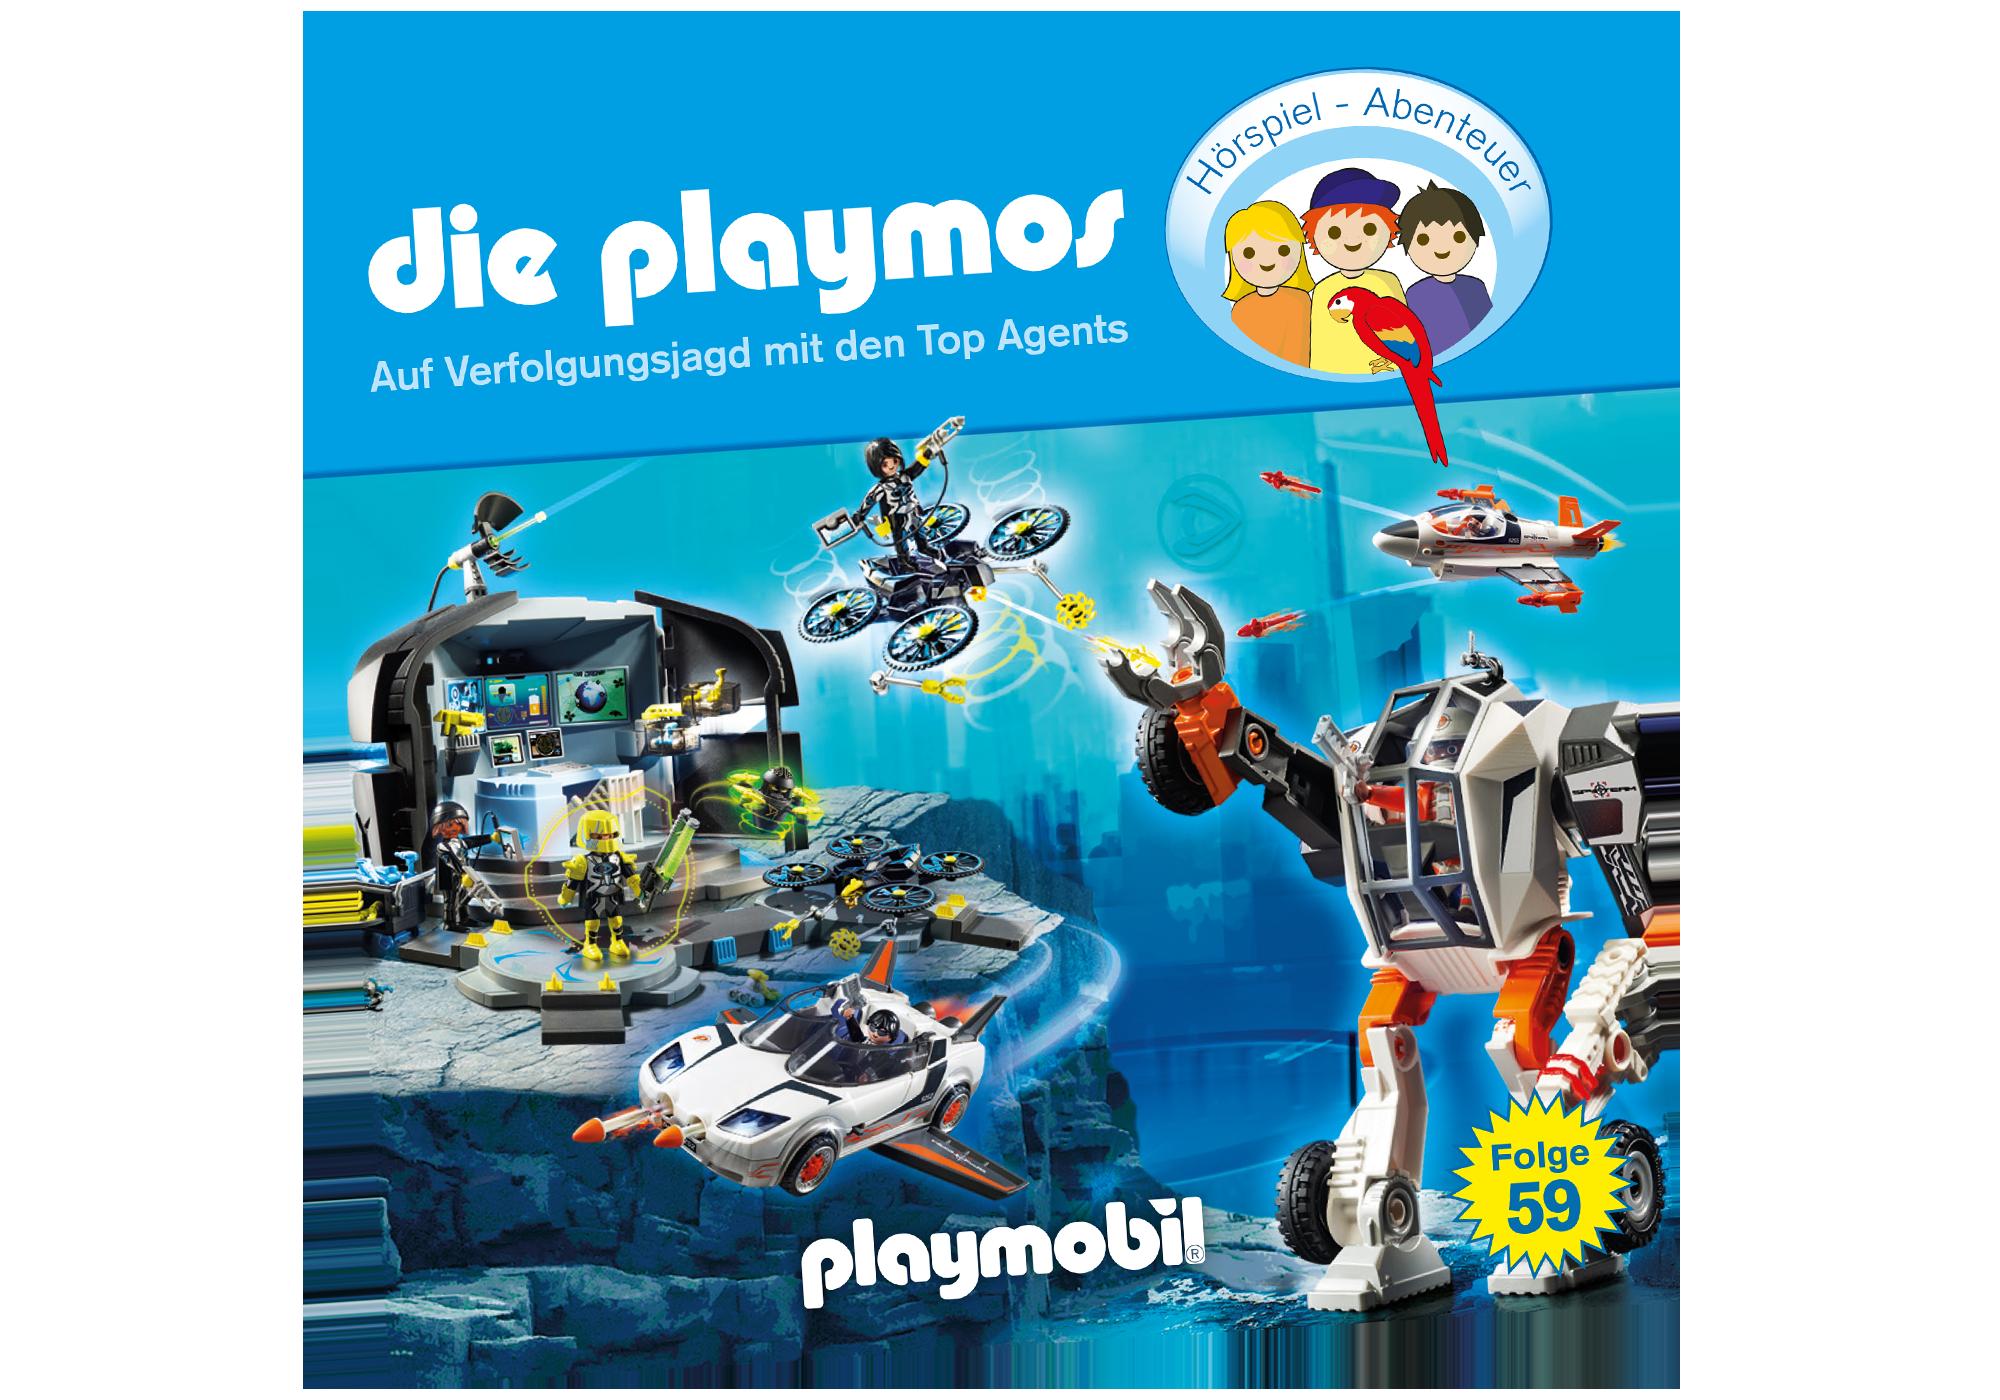 http://media.playmobil.com/i/playmobil/80061_product_detail